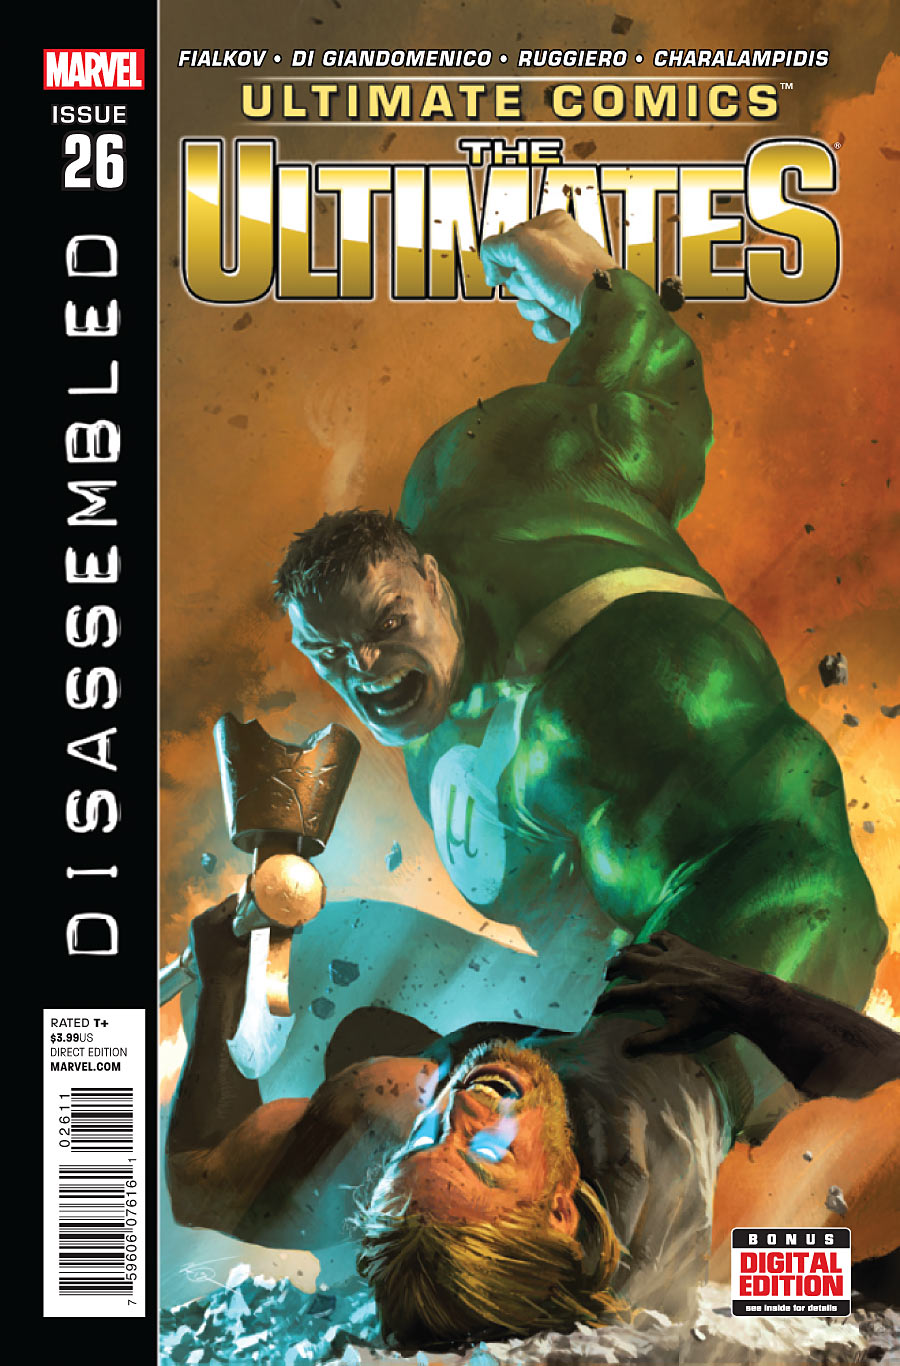 Ultimate Comics: The Ultimates #26